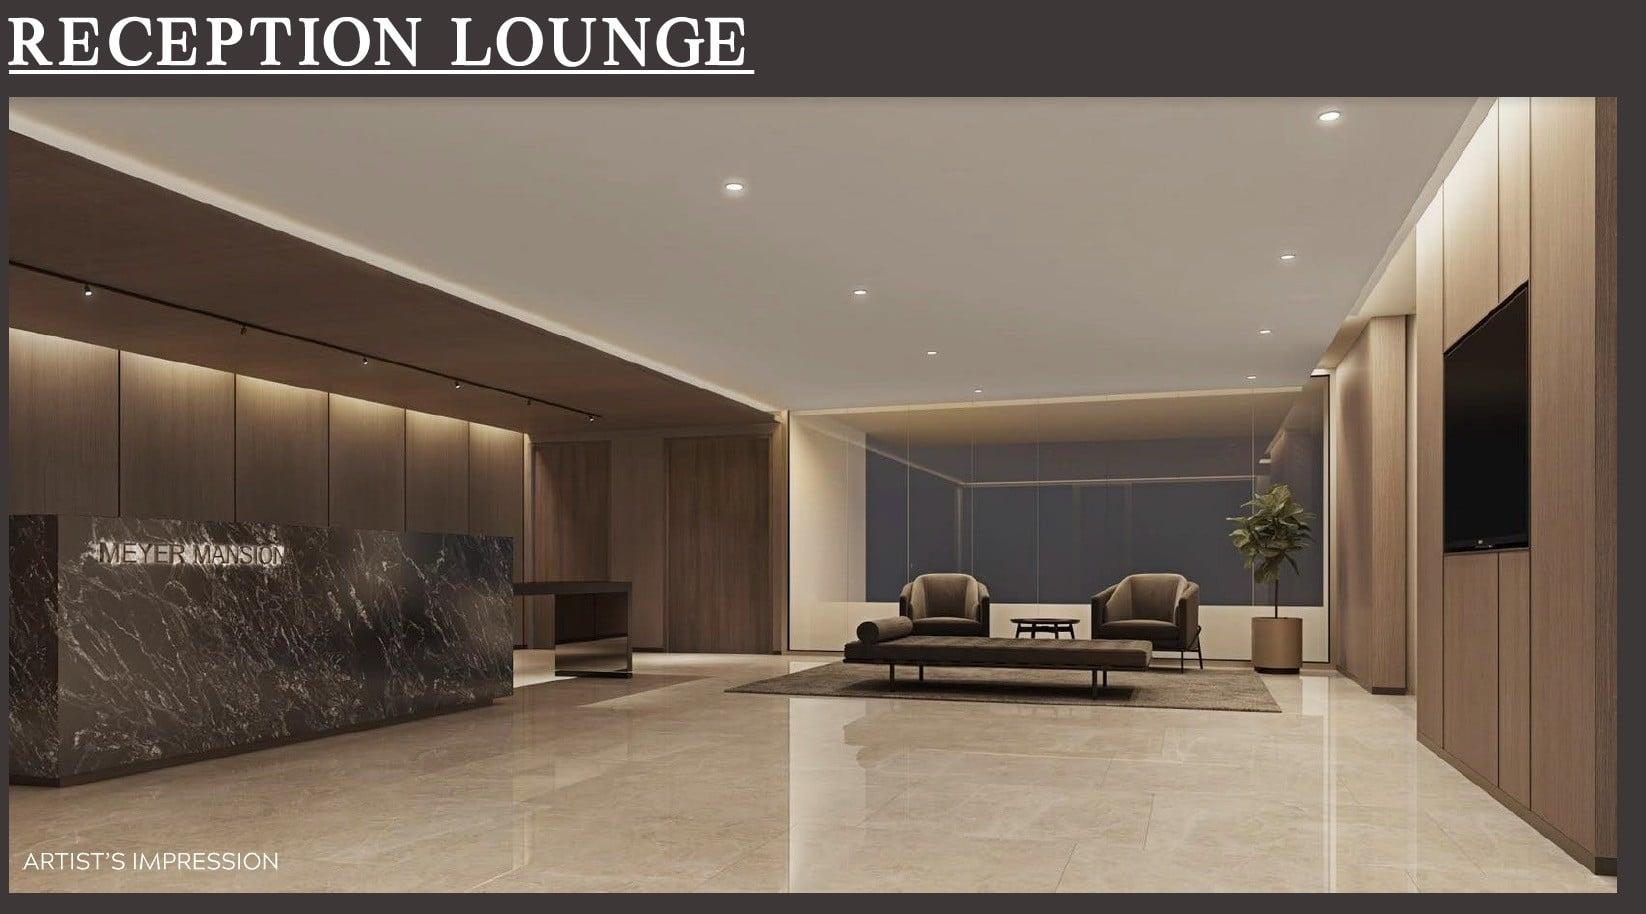 Meyer-Mansion-Reception Lounge